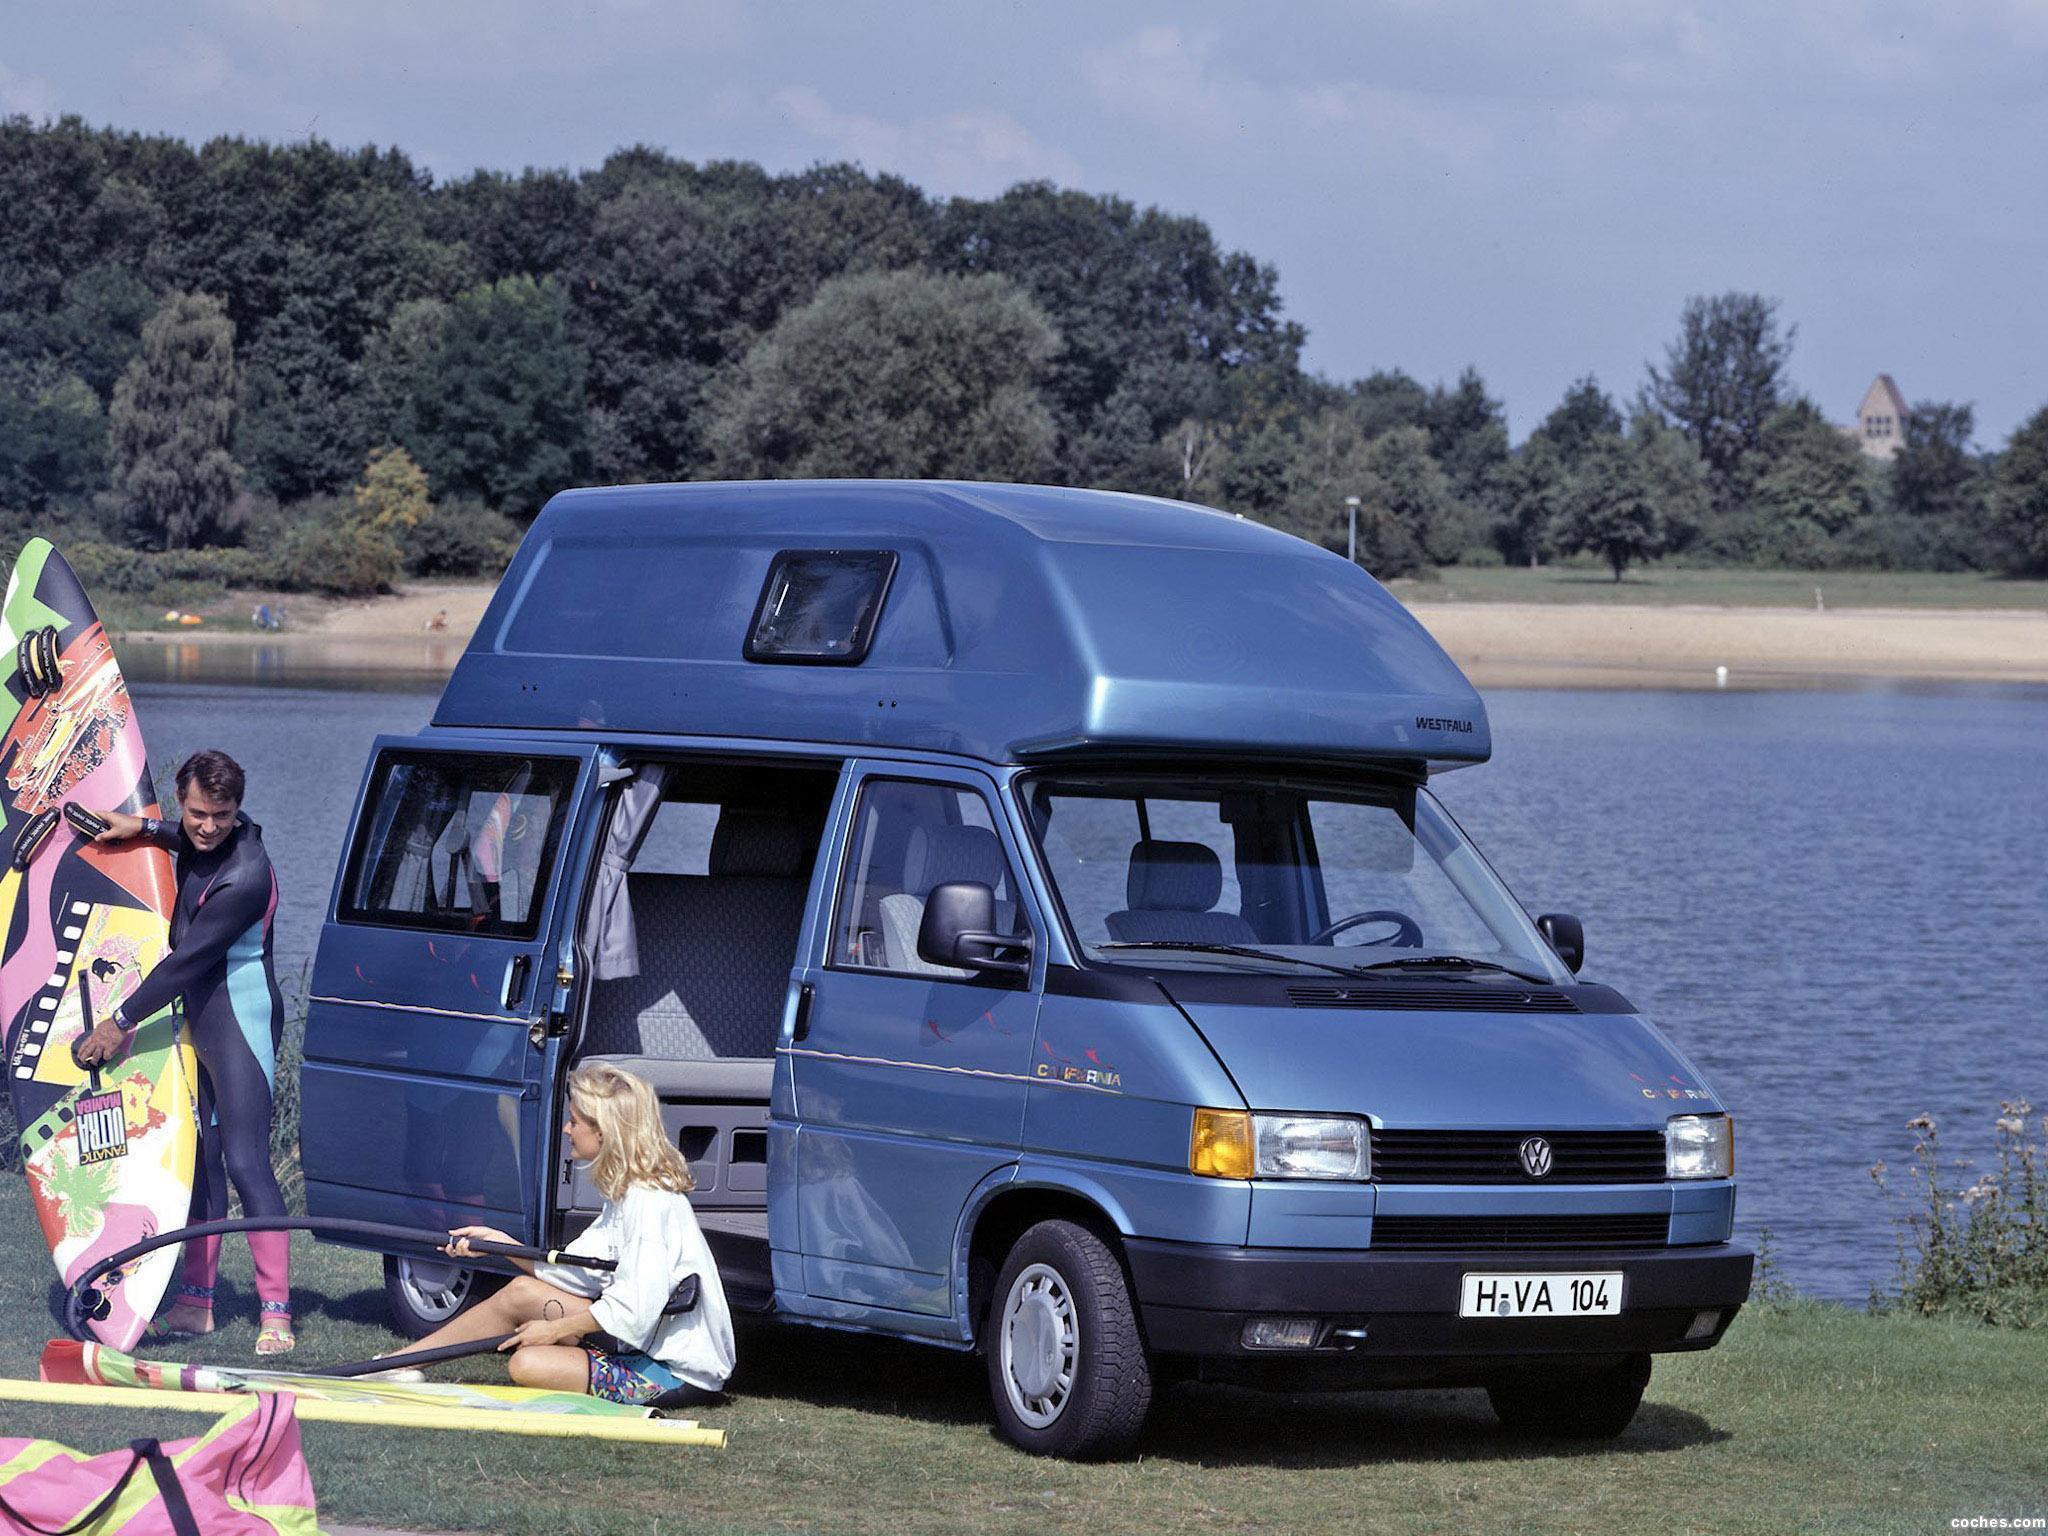 westfalia_volkswagen-t4-california-1991-96_r1.jpg